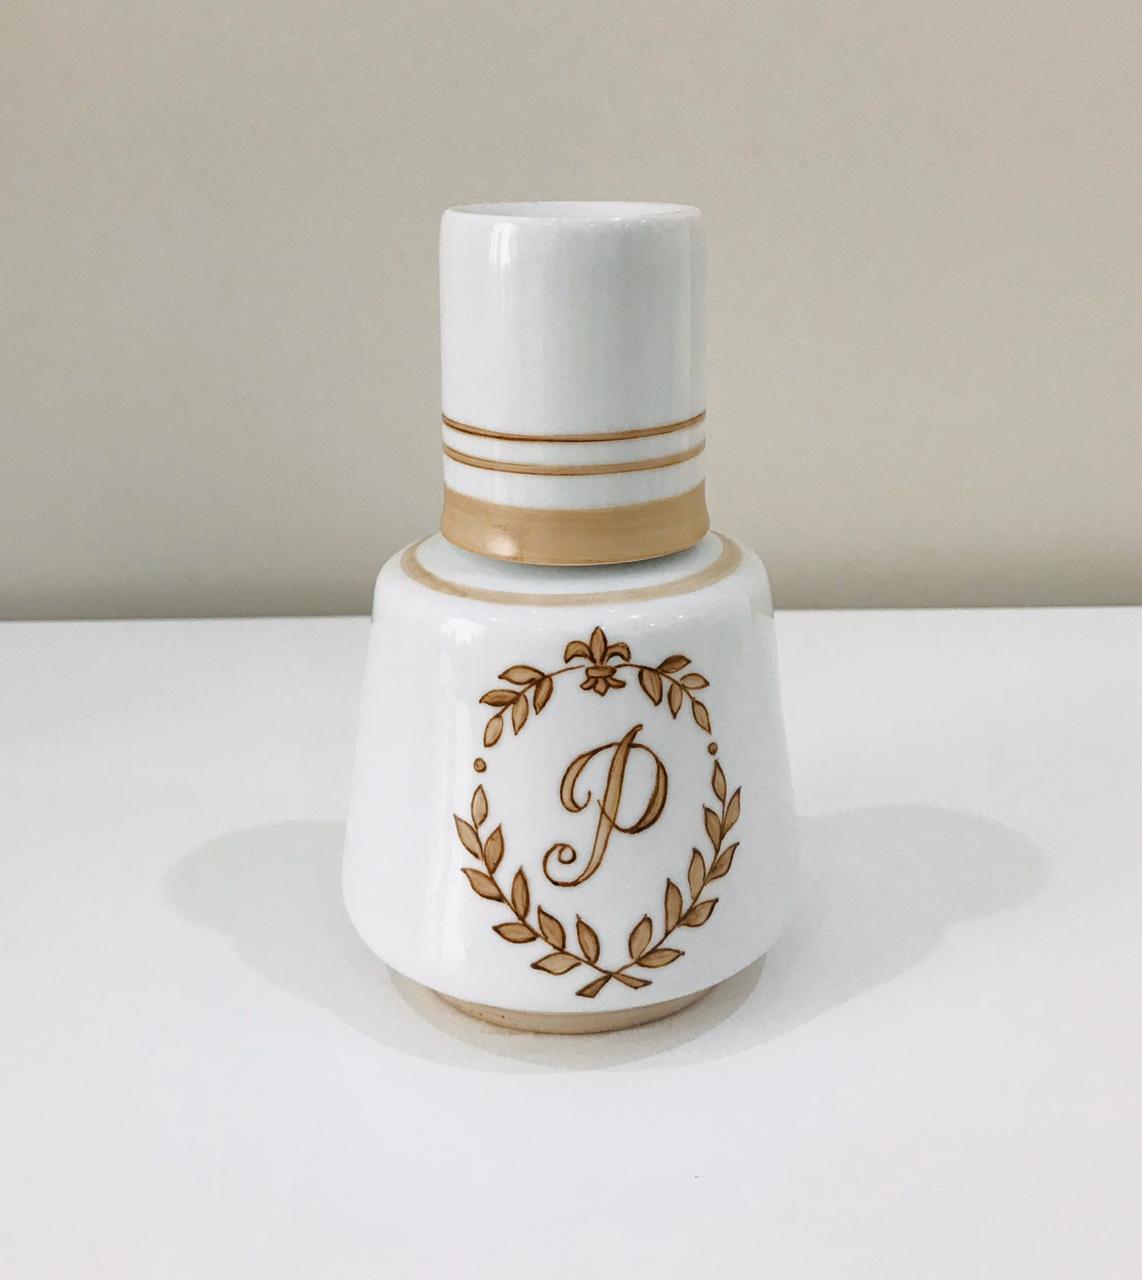 Kit de Higiene Letra P Branco com Bege - 4 Peças